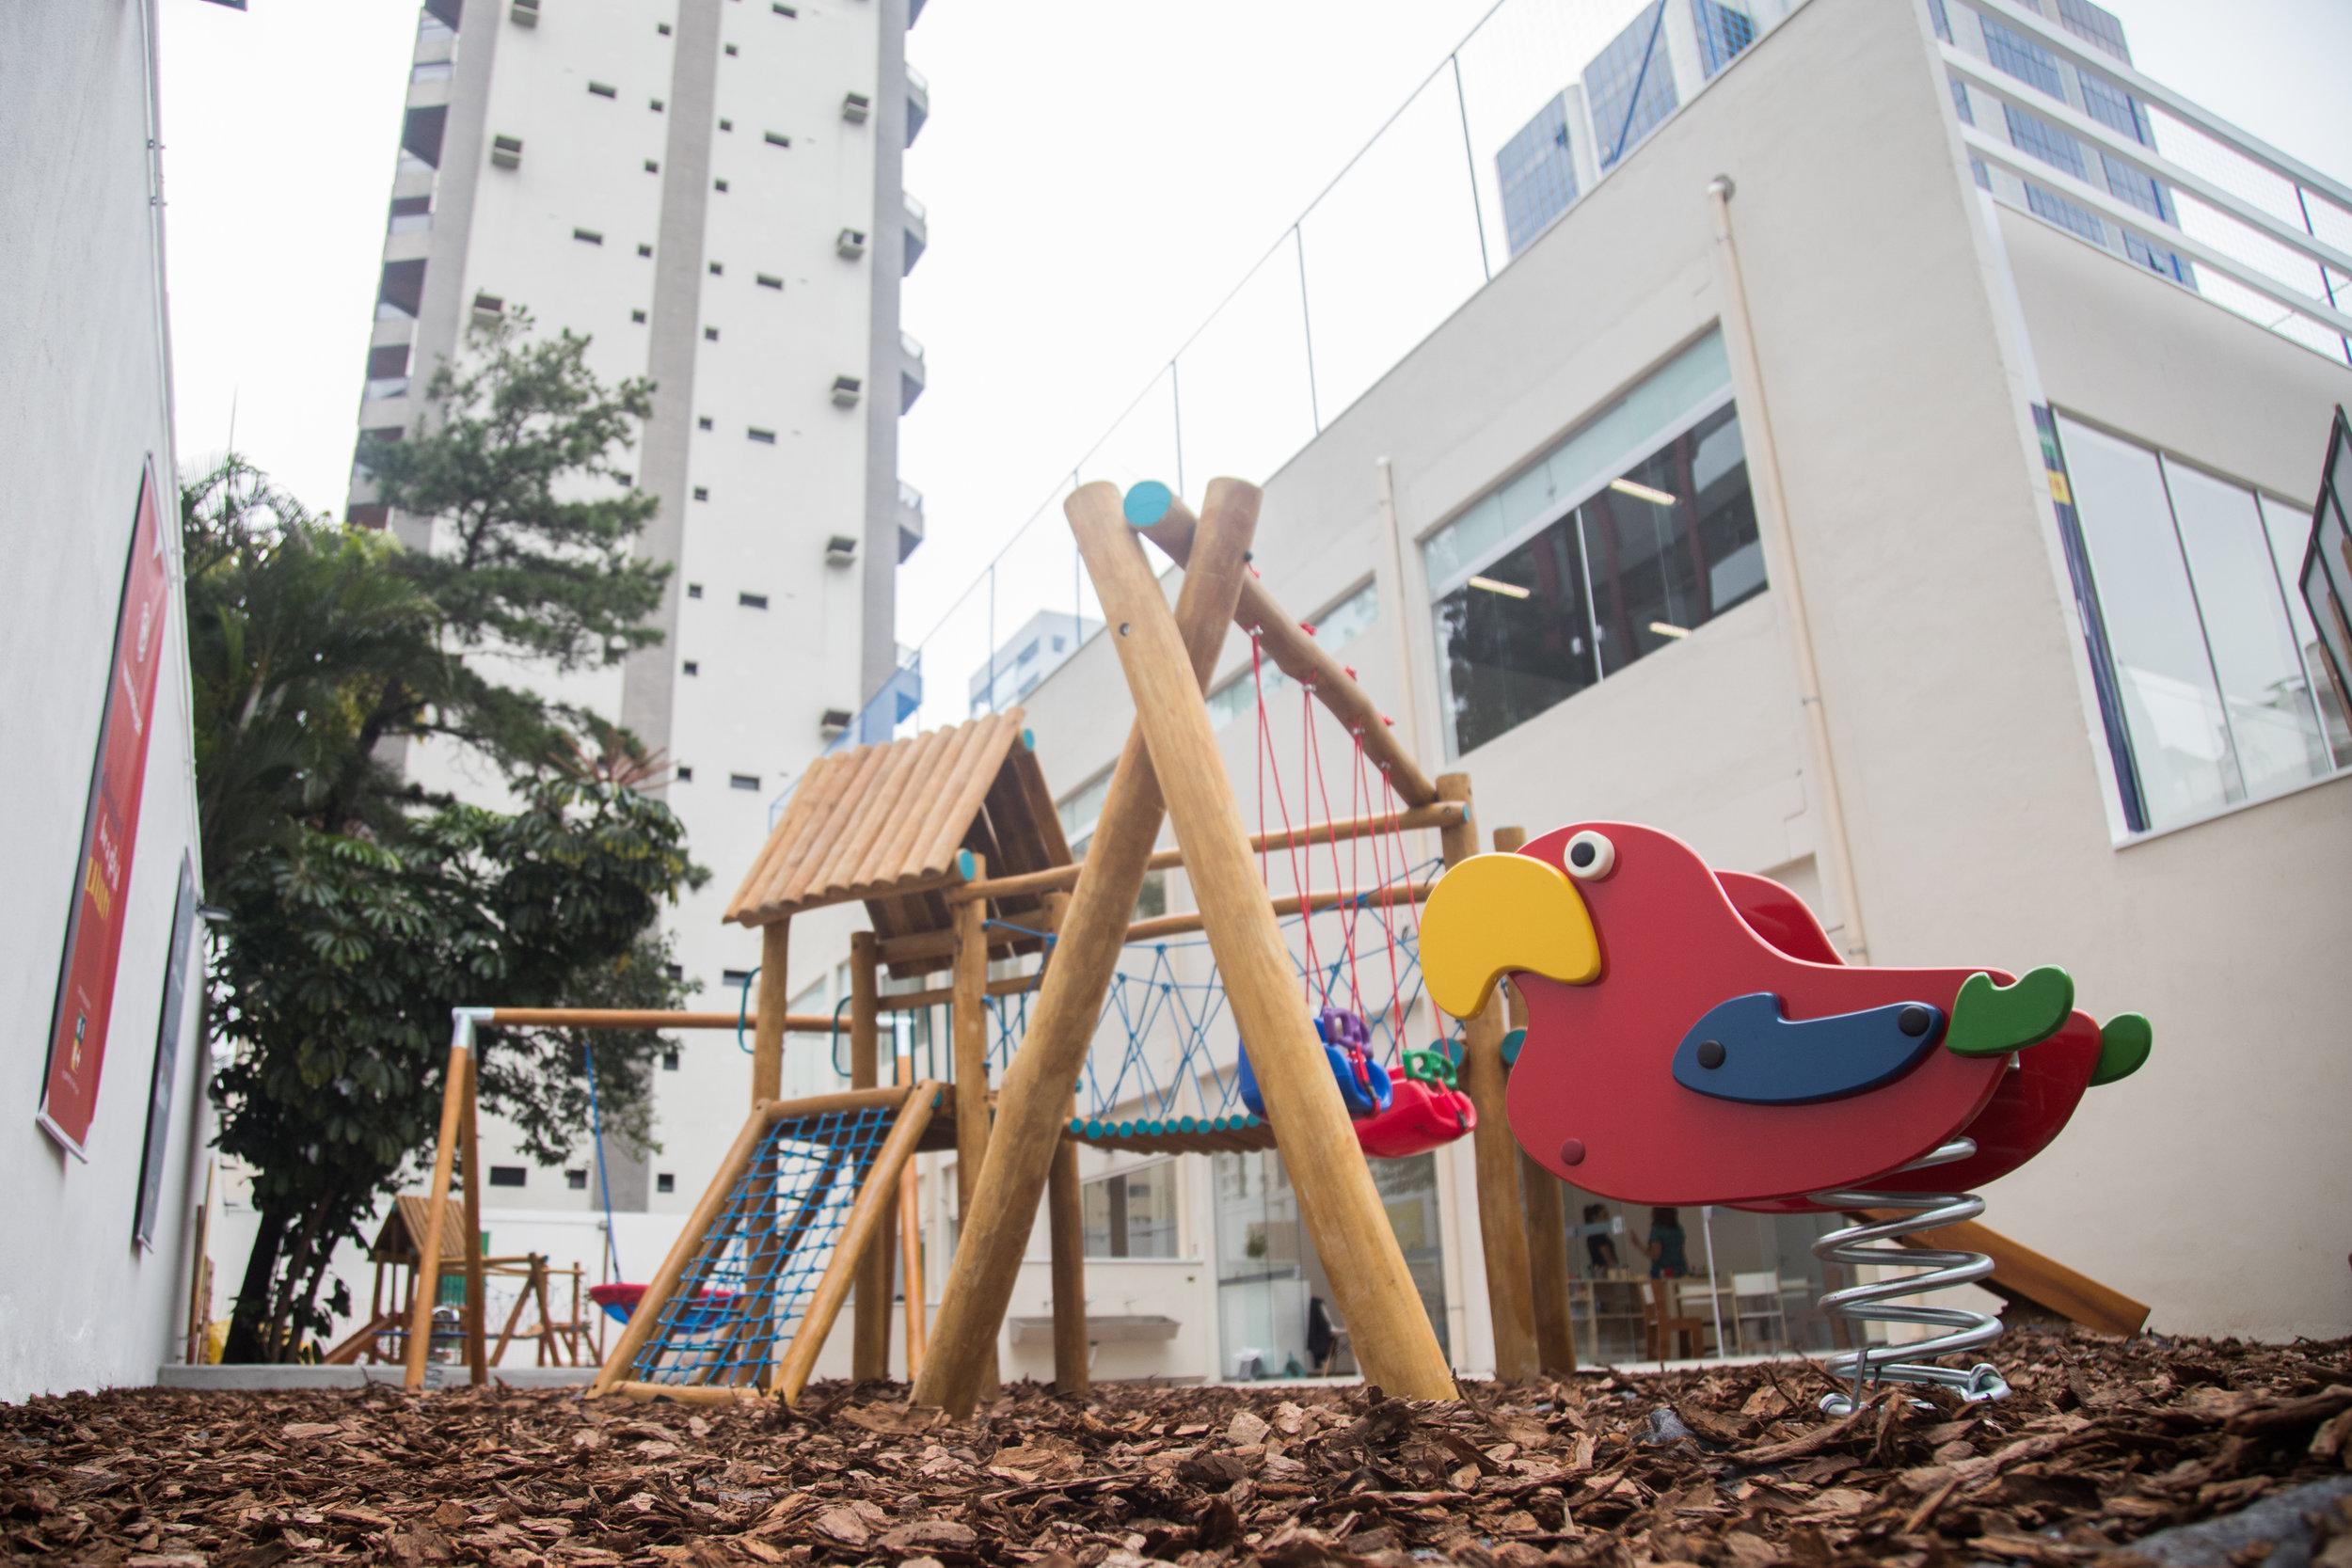 FOTOS - THE INTERNATIONAL SCHOOL OF SÃO PAULO 13.jpg